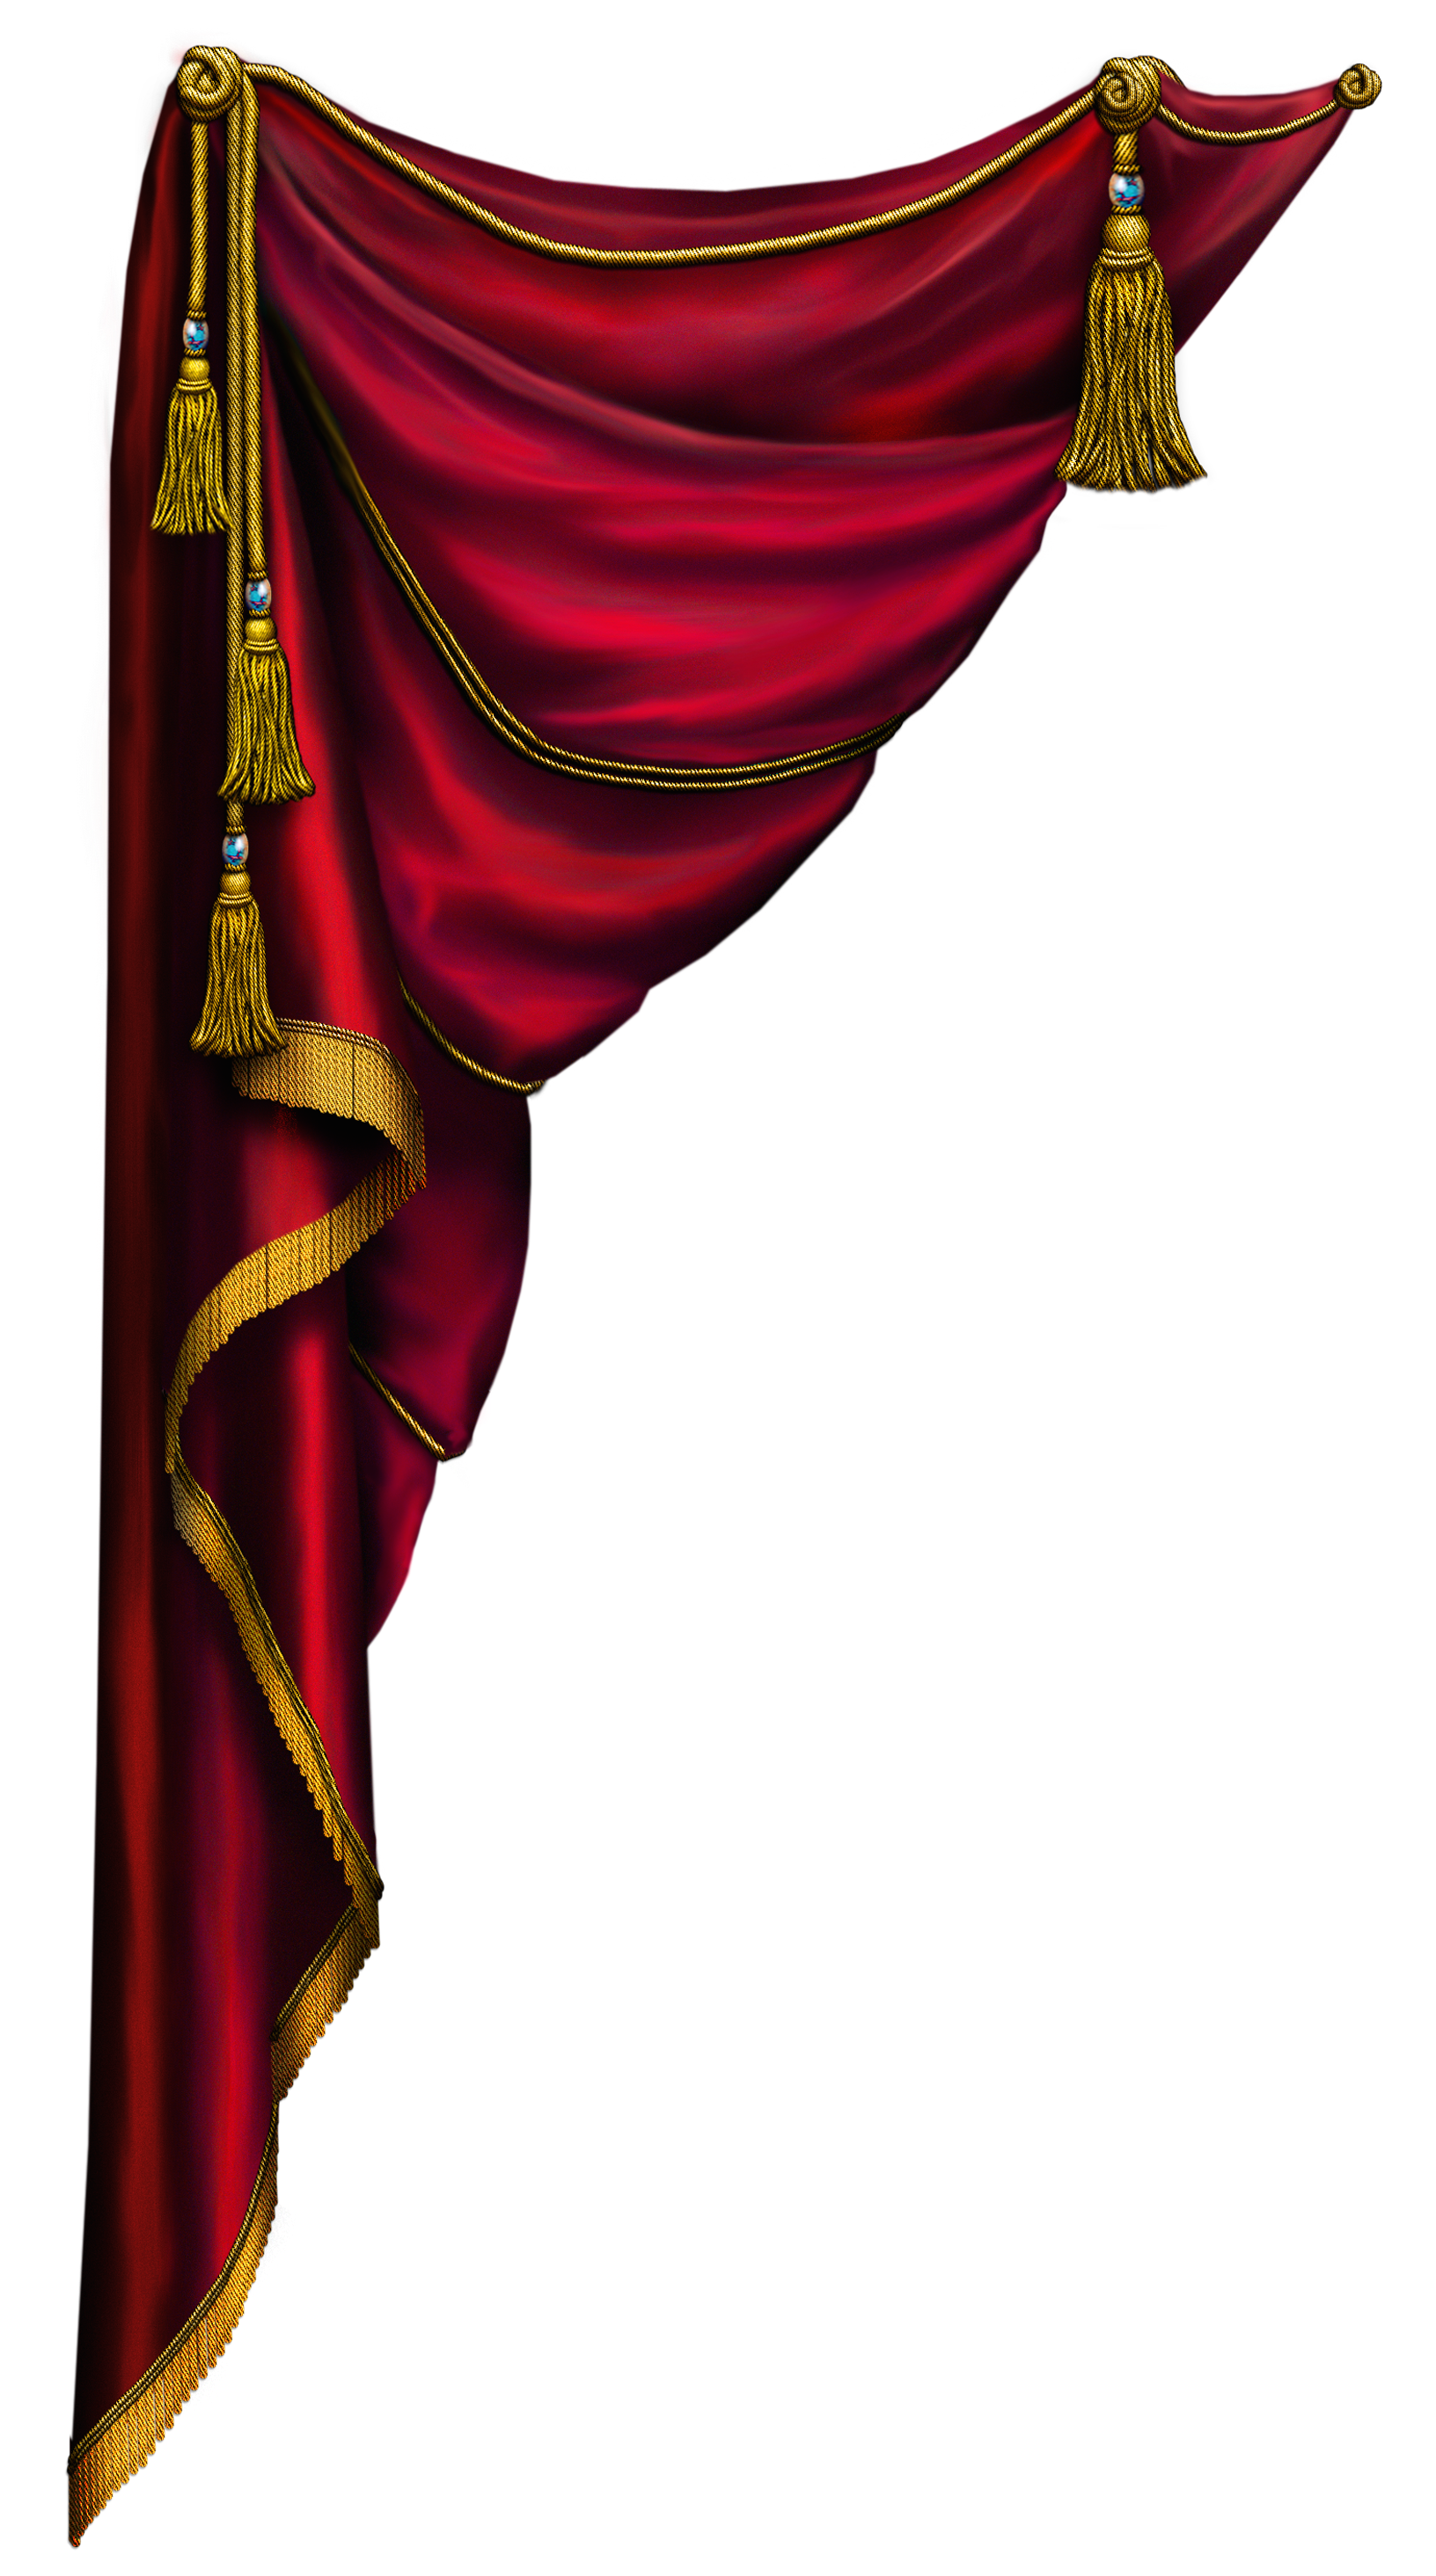 Curtains clipart mandap. Red curtain left miscellaneous